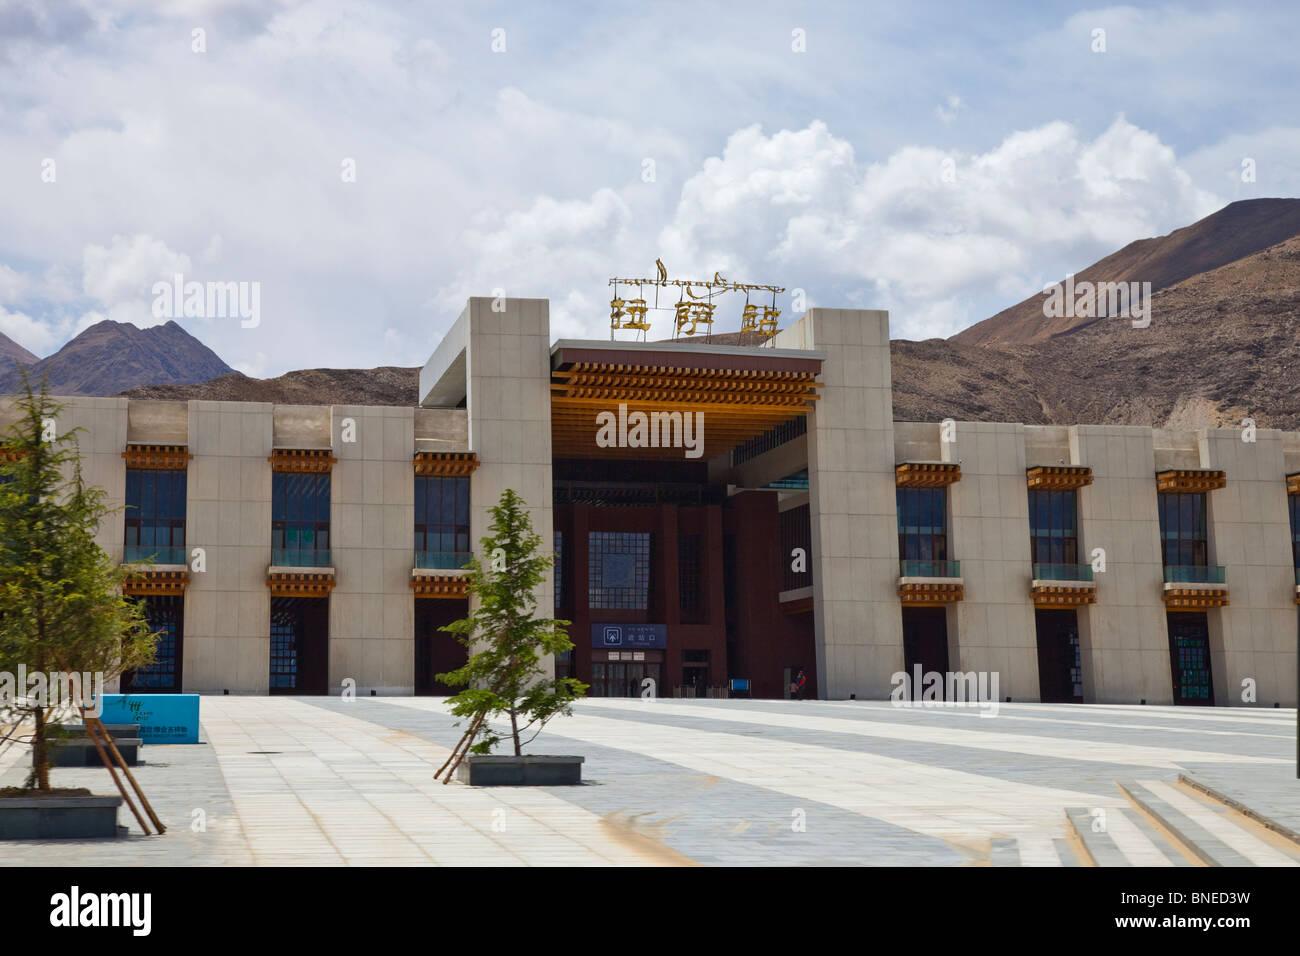 Railway station in Lhasa, Tibet - Stock Image